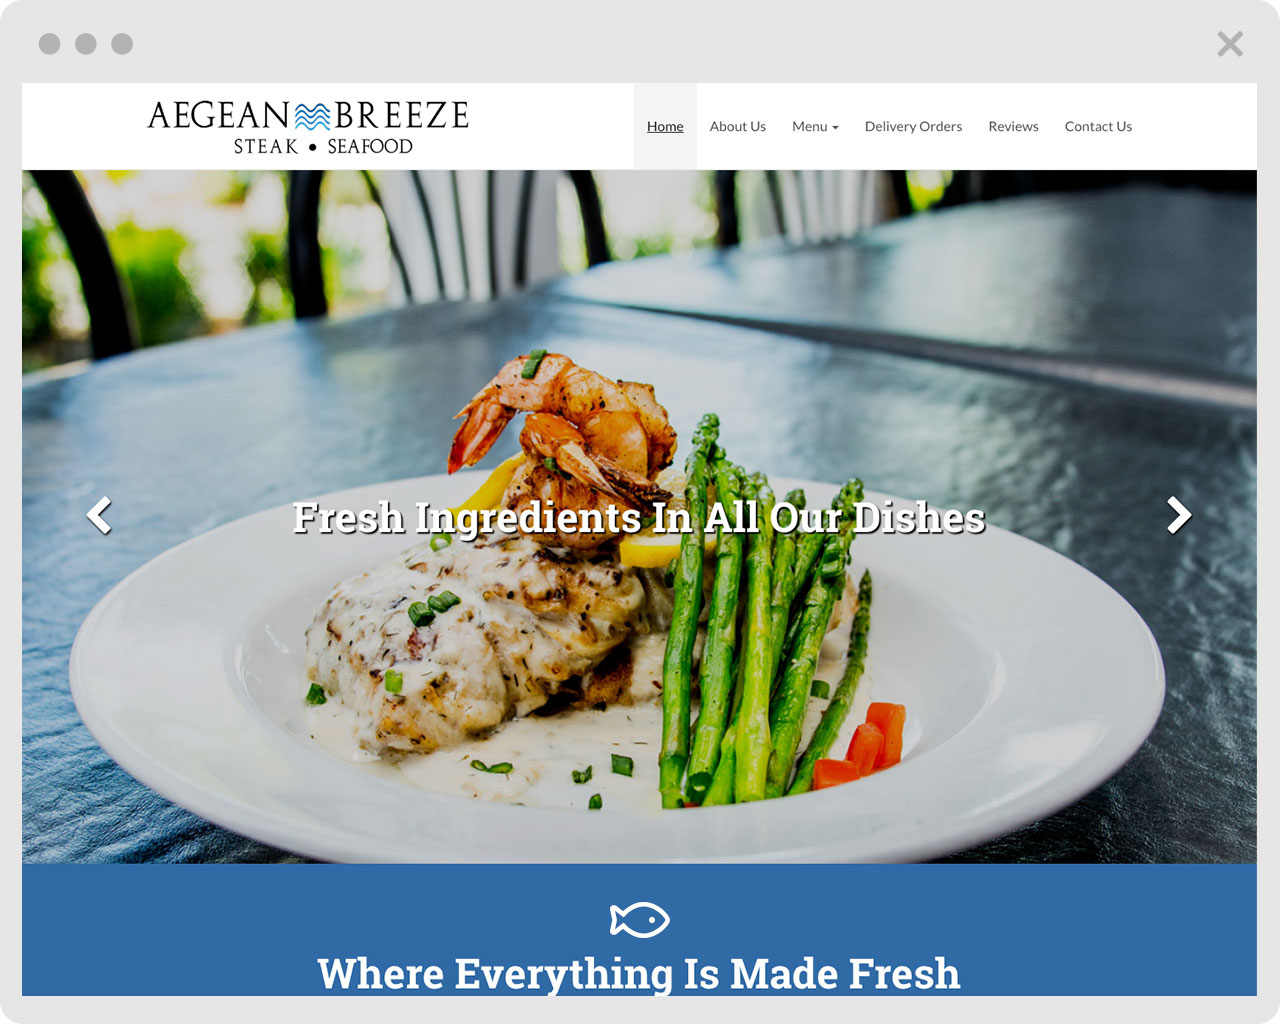 image of Aegean Breeze website